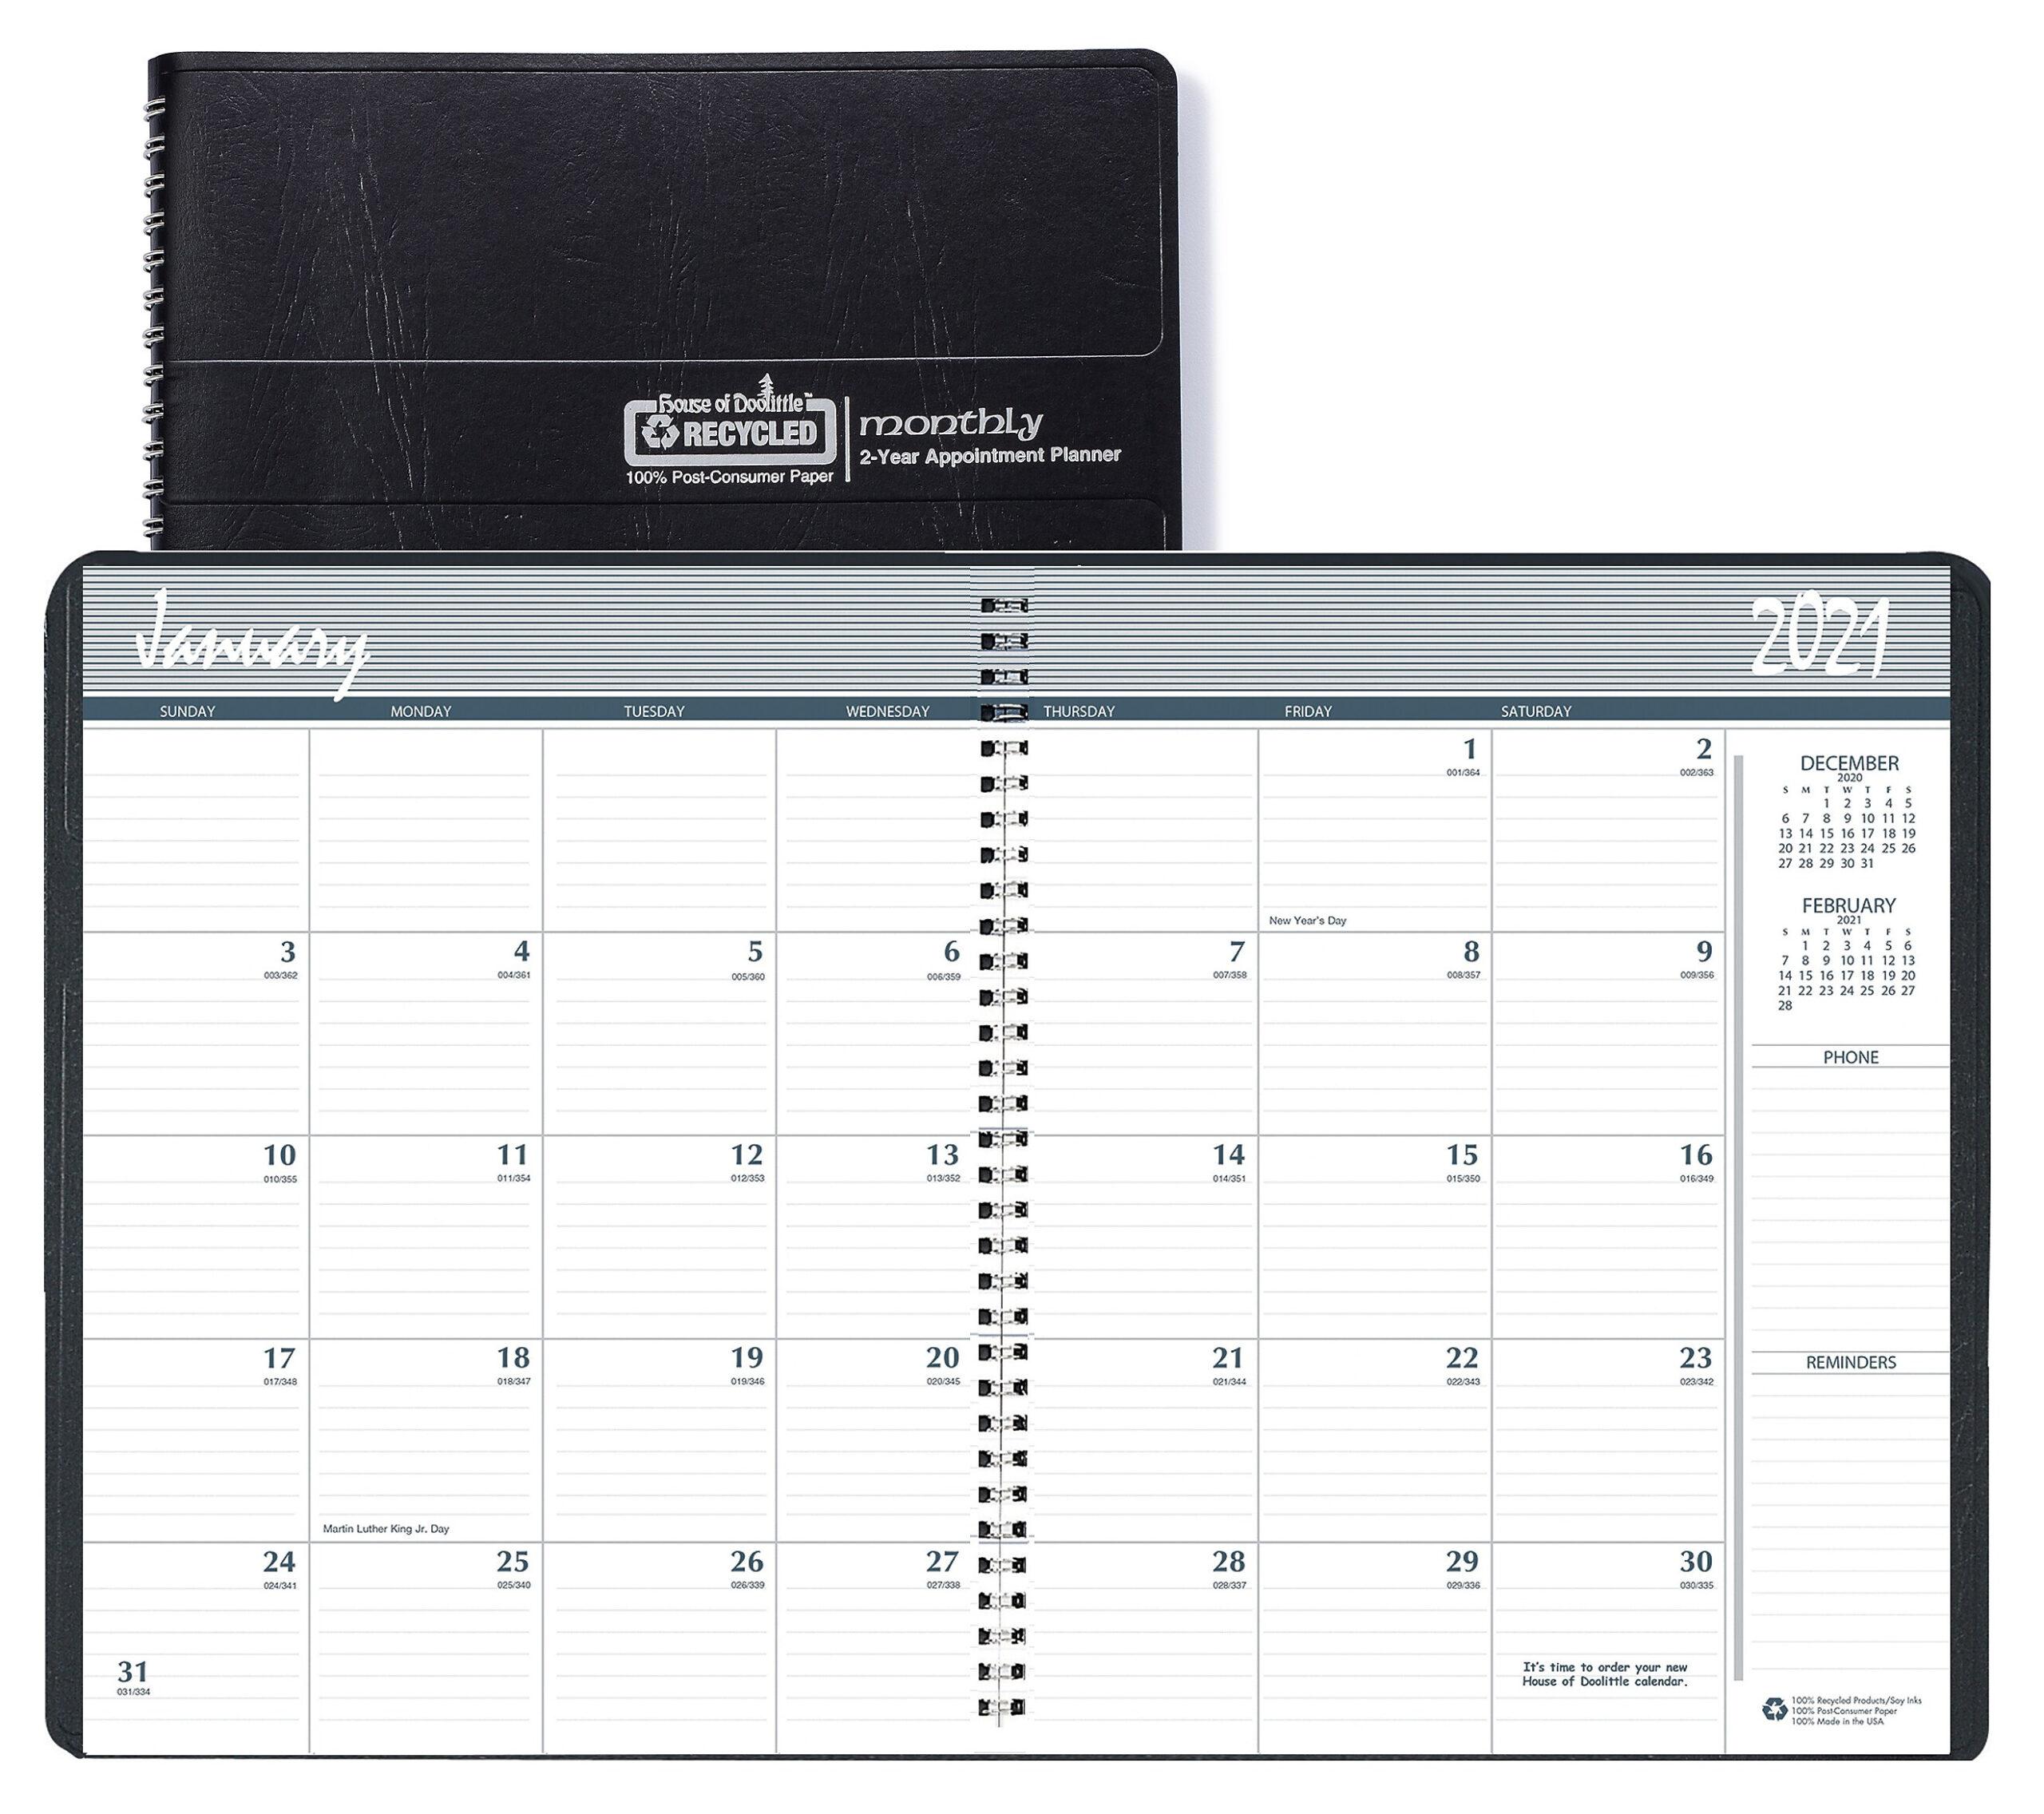 Blue Sky 2021 8.5 X 11 2-Year Monthly Planner, Black 26200221 - Walmart